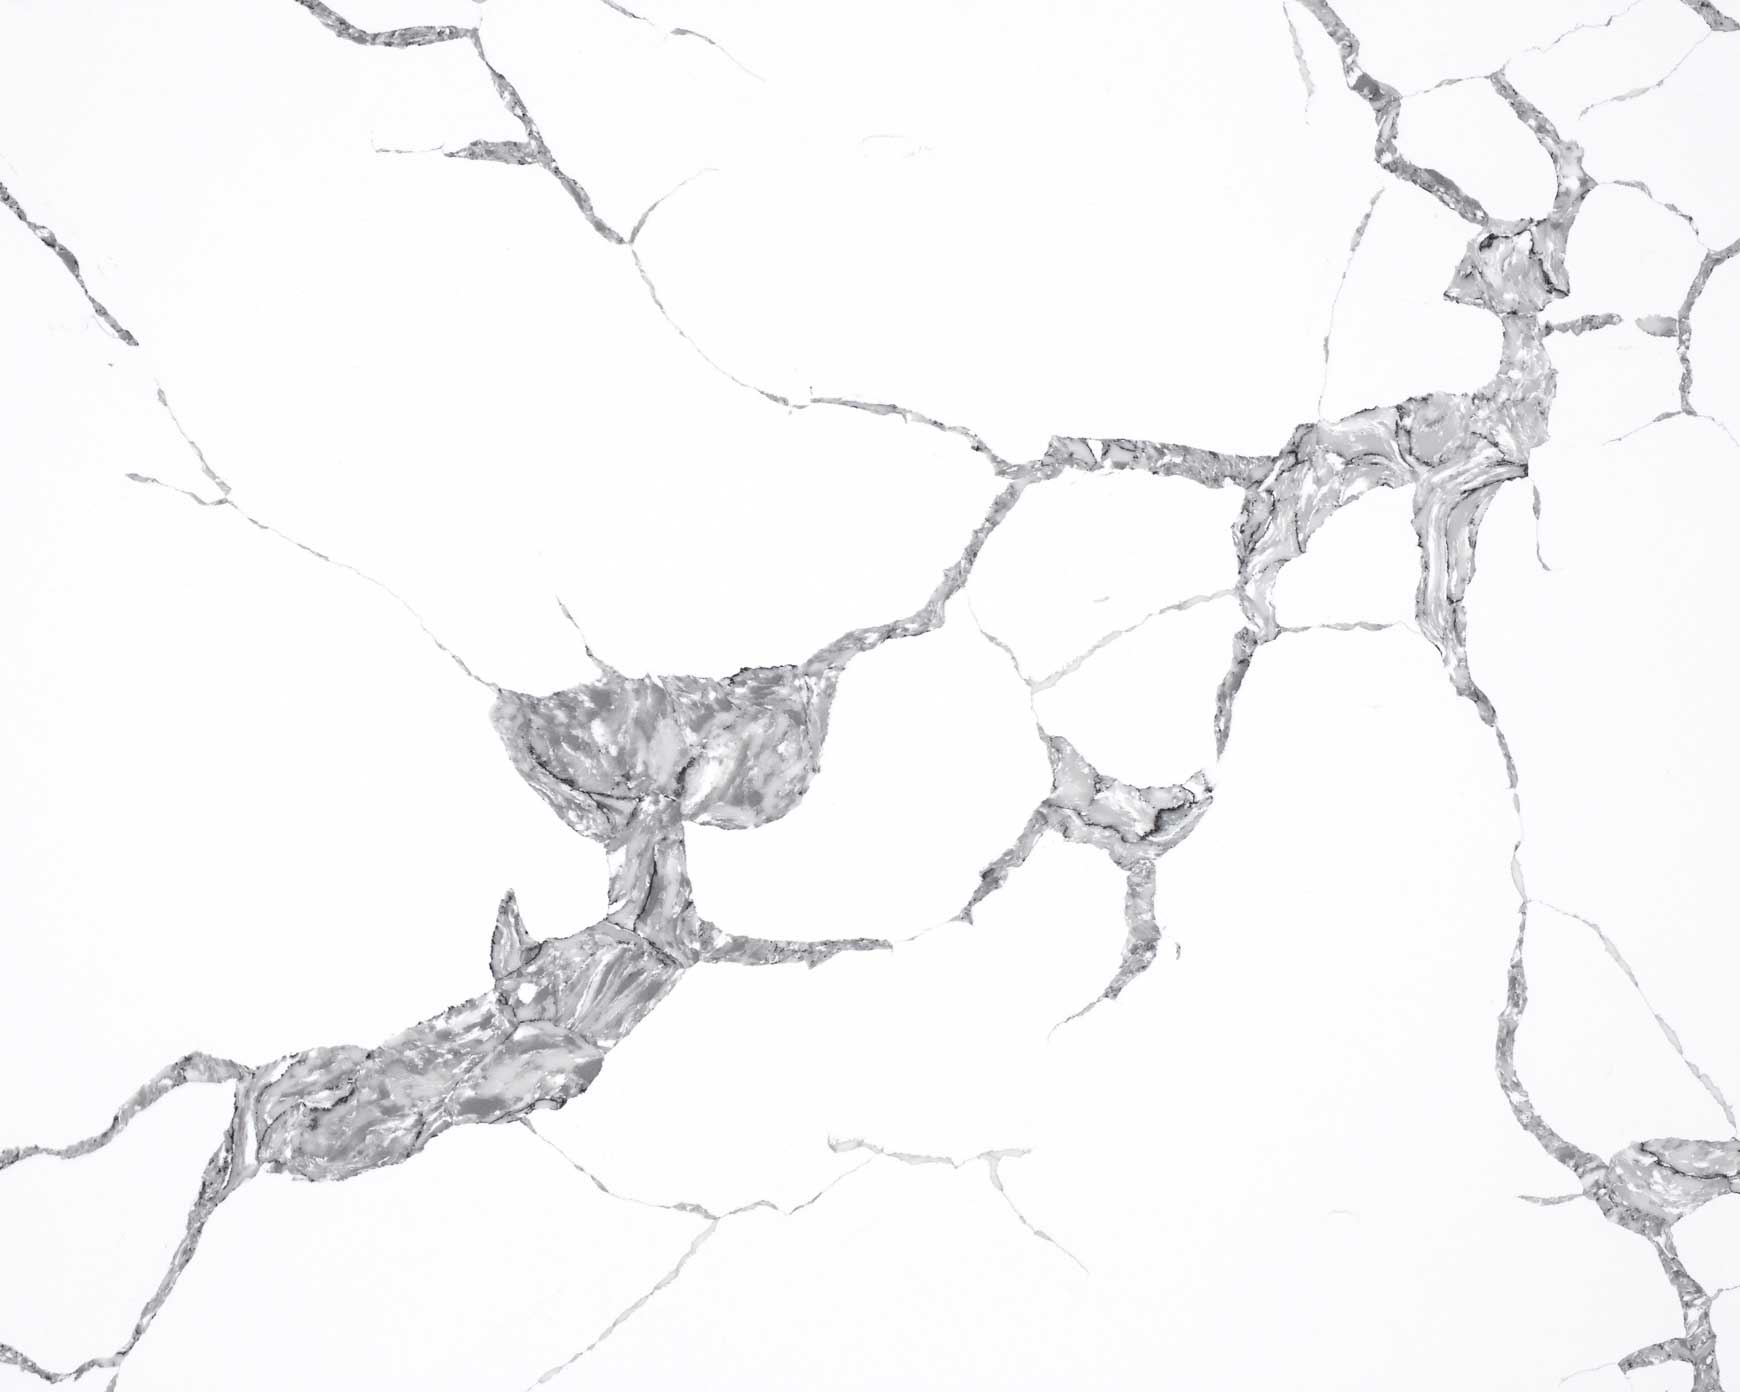 marble-looked quartz slabs